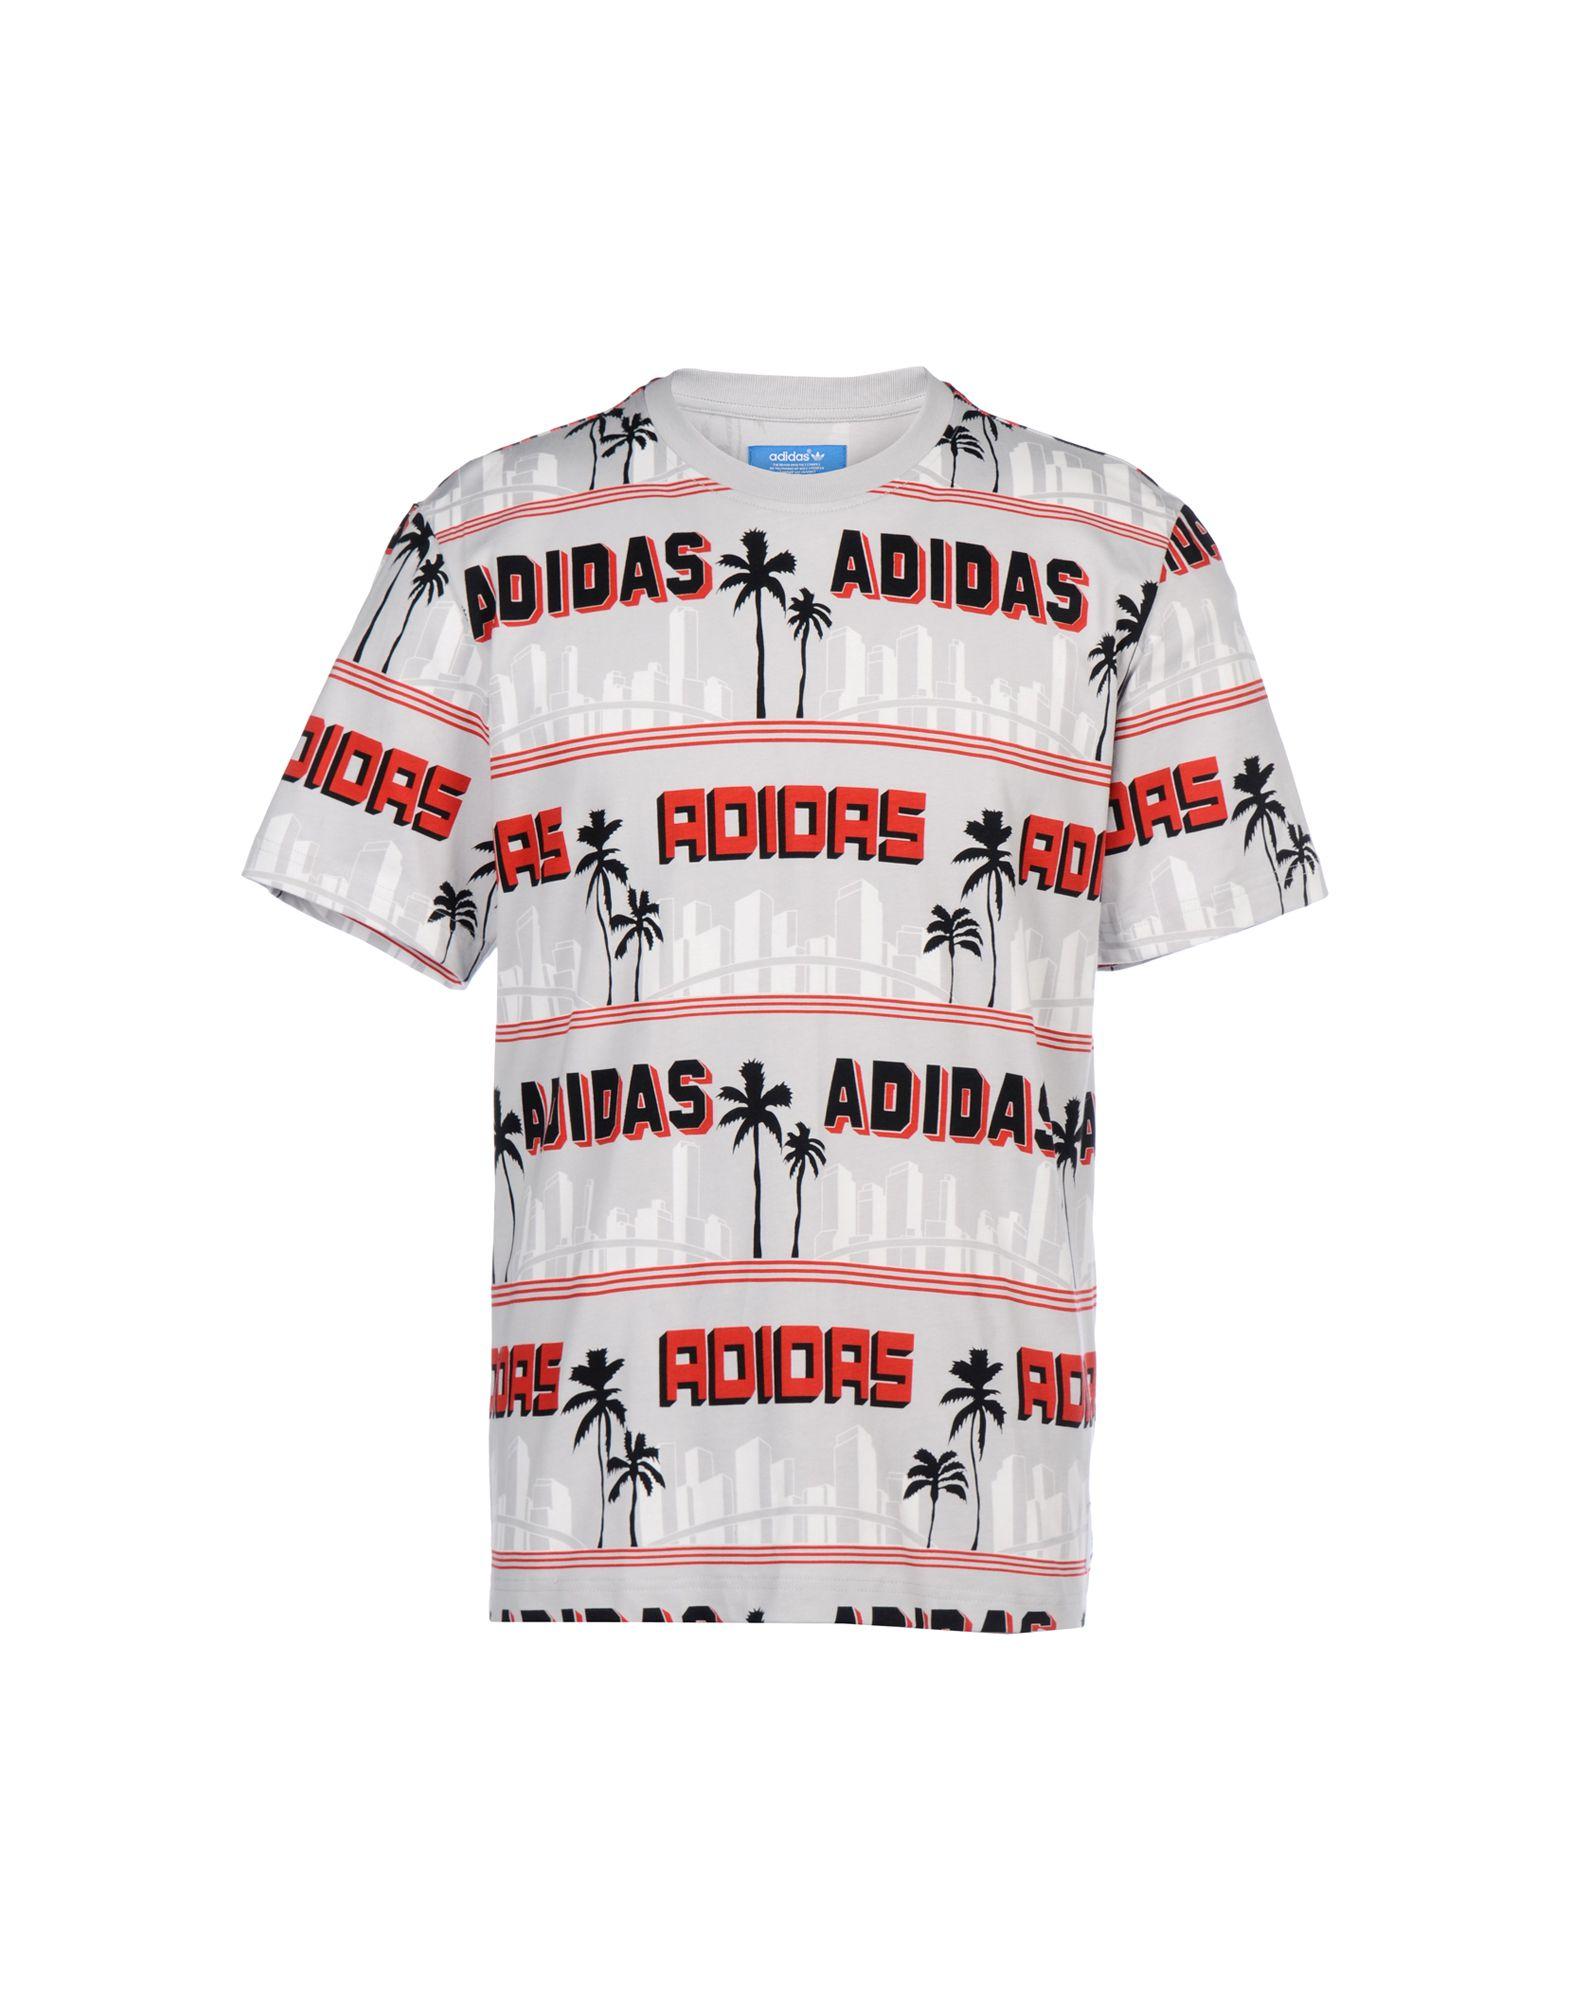 ADIDAS ORIGINALS by NIGO Футболка adidas originals by pharrell williams толстовка